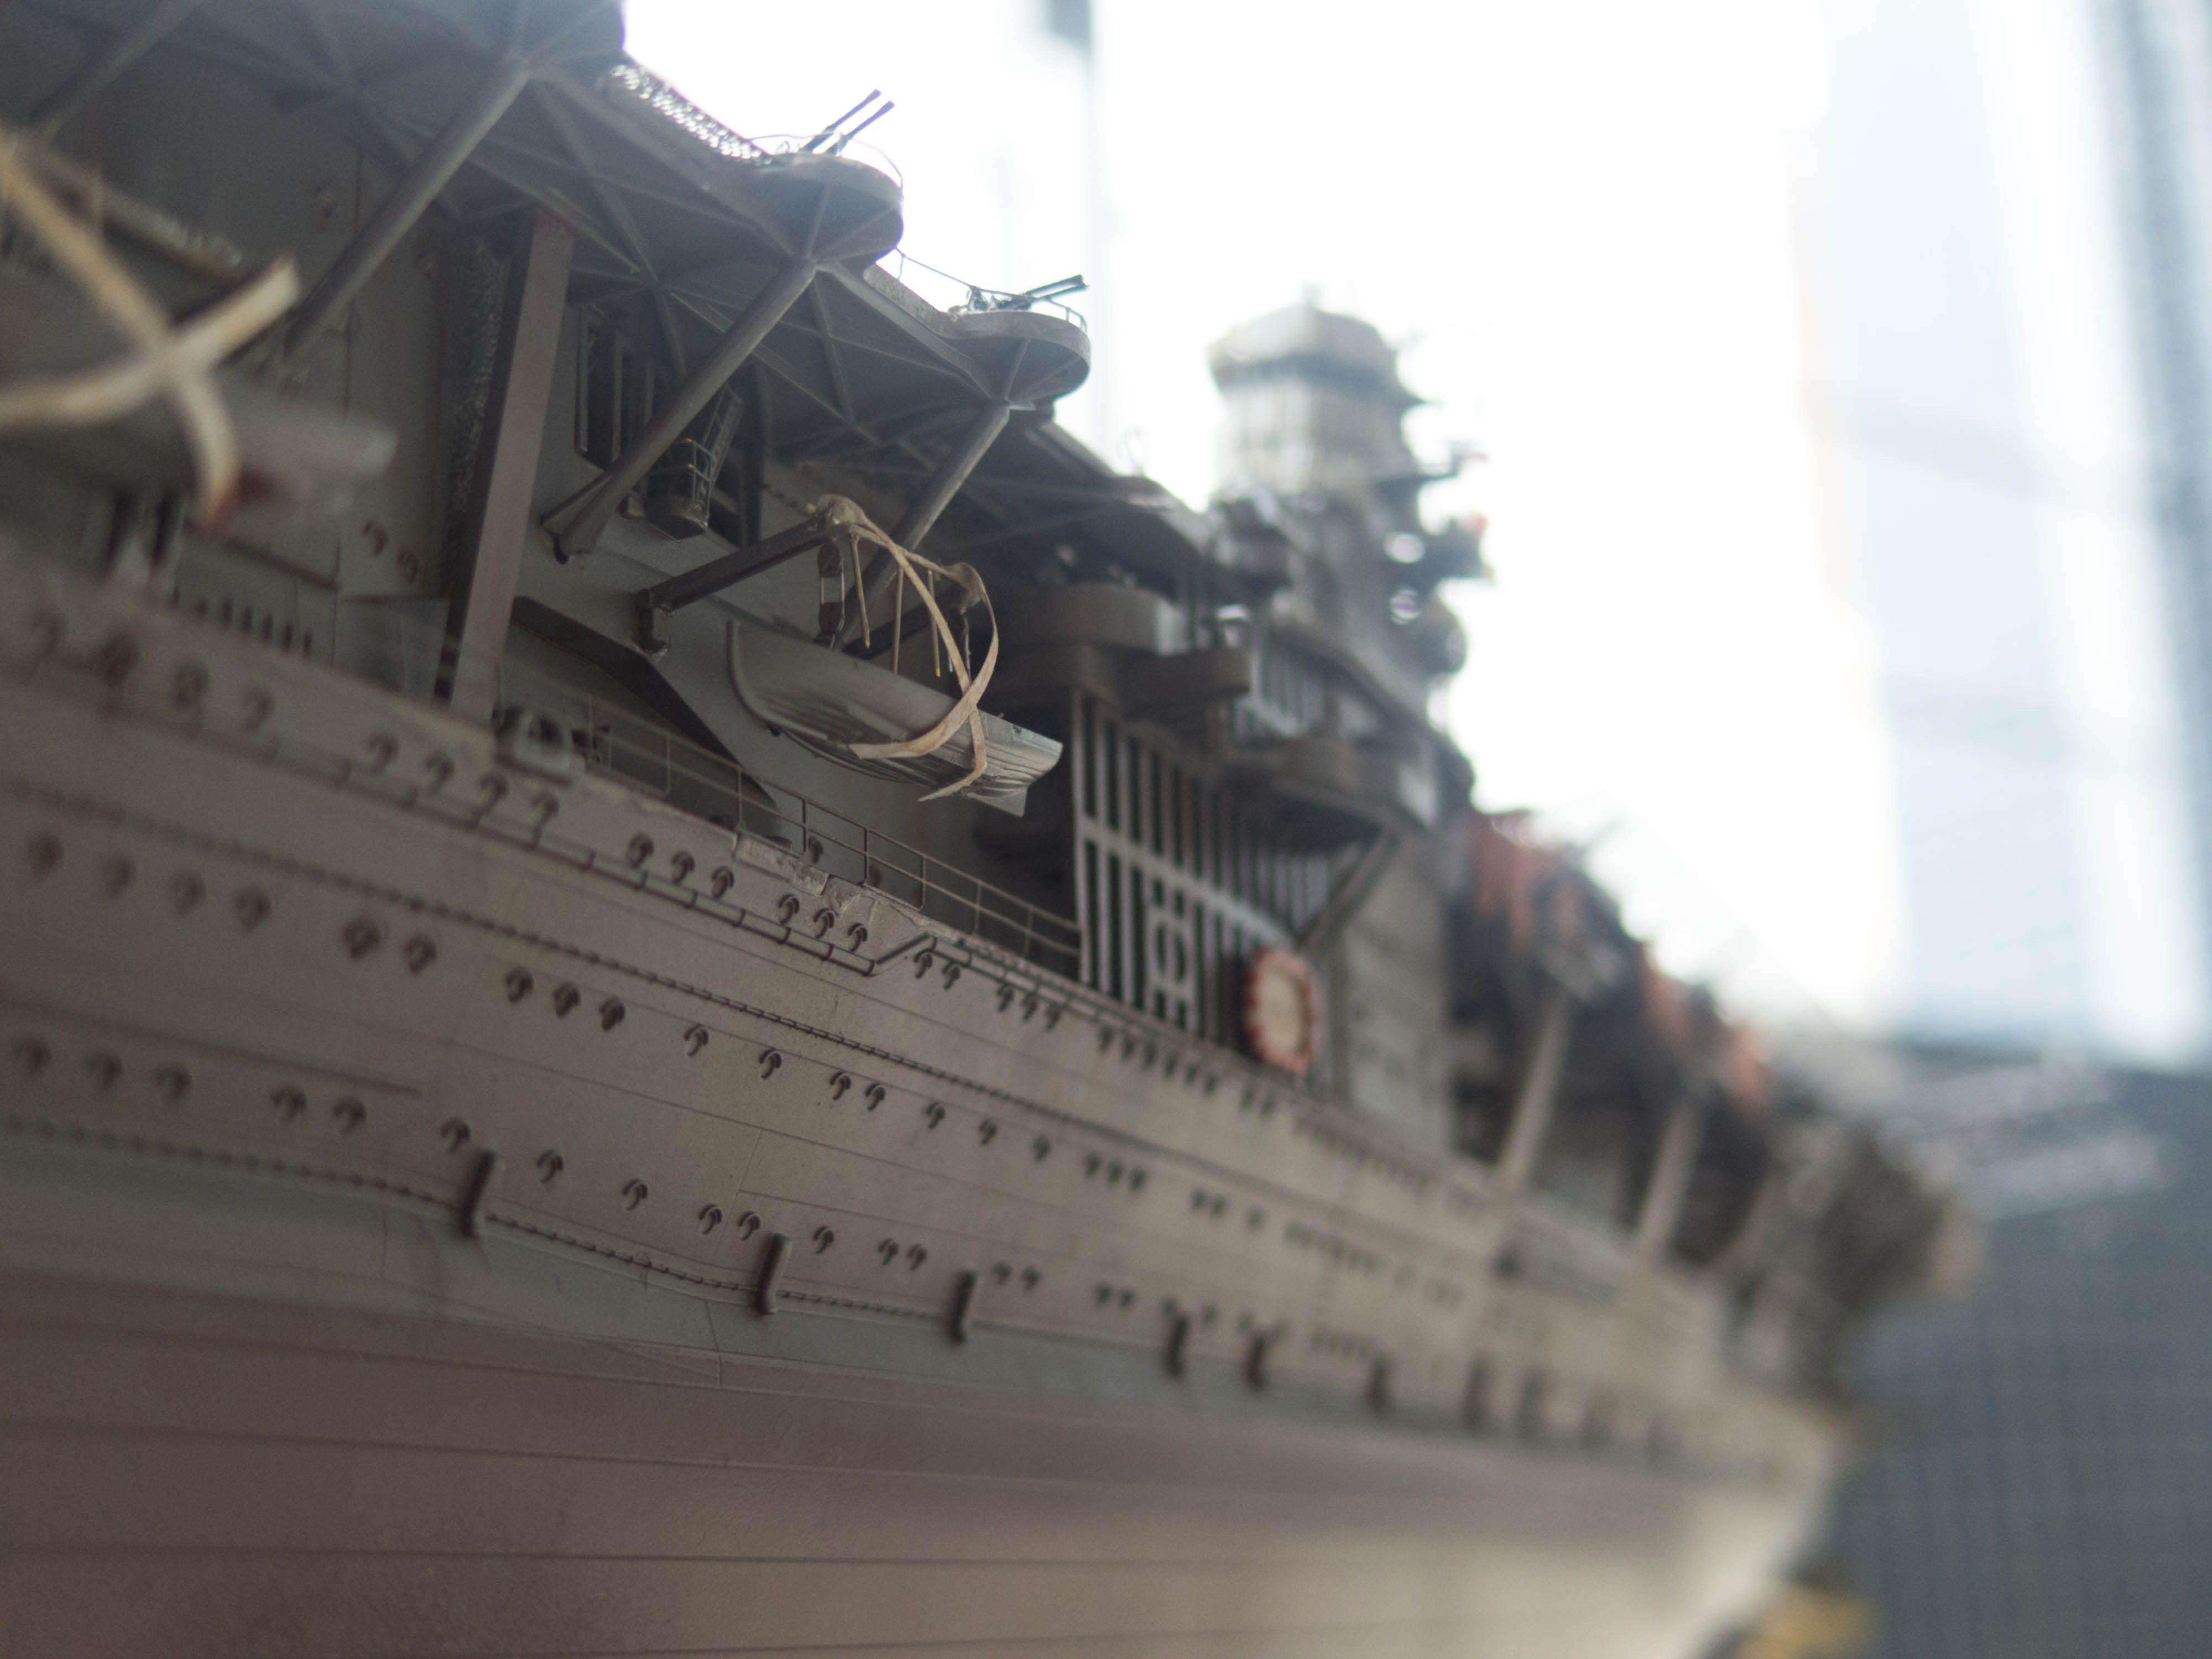 Wwii italy navy battleship roma 1943 plastic model images list - Plastic Model Hasegawa 1 350 Ijn Aircraft Carrier Akagi